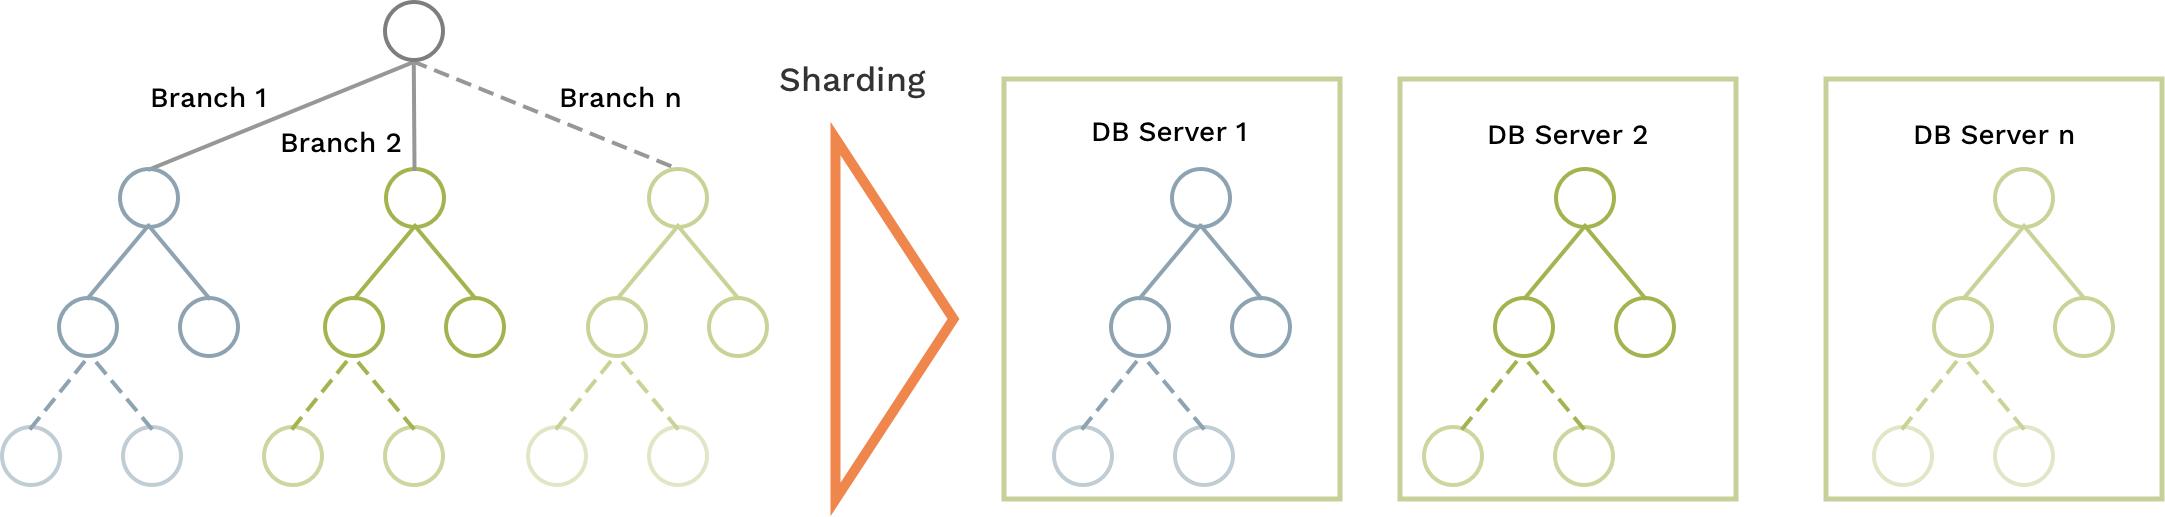 ArangoDB Disjoint SmartGraphs Schema